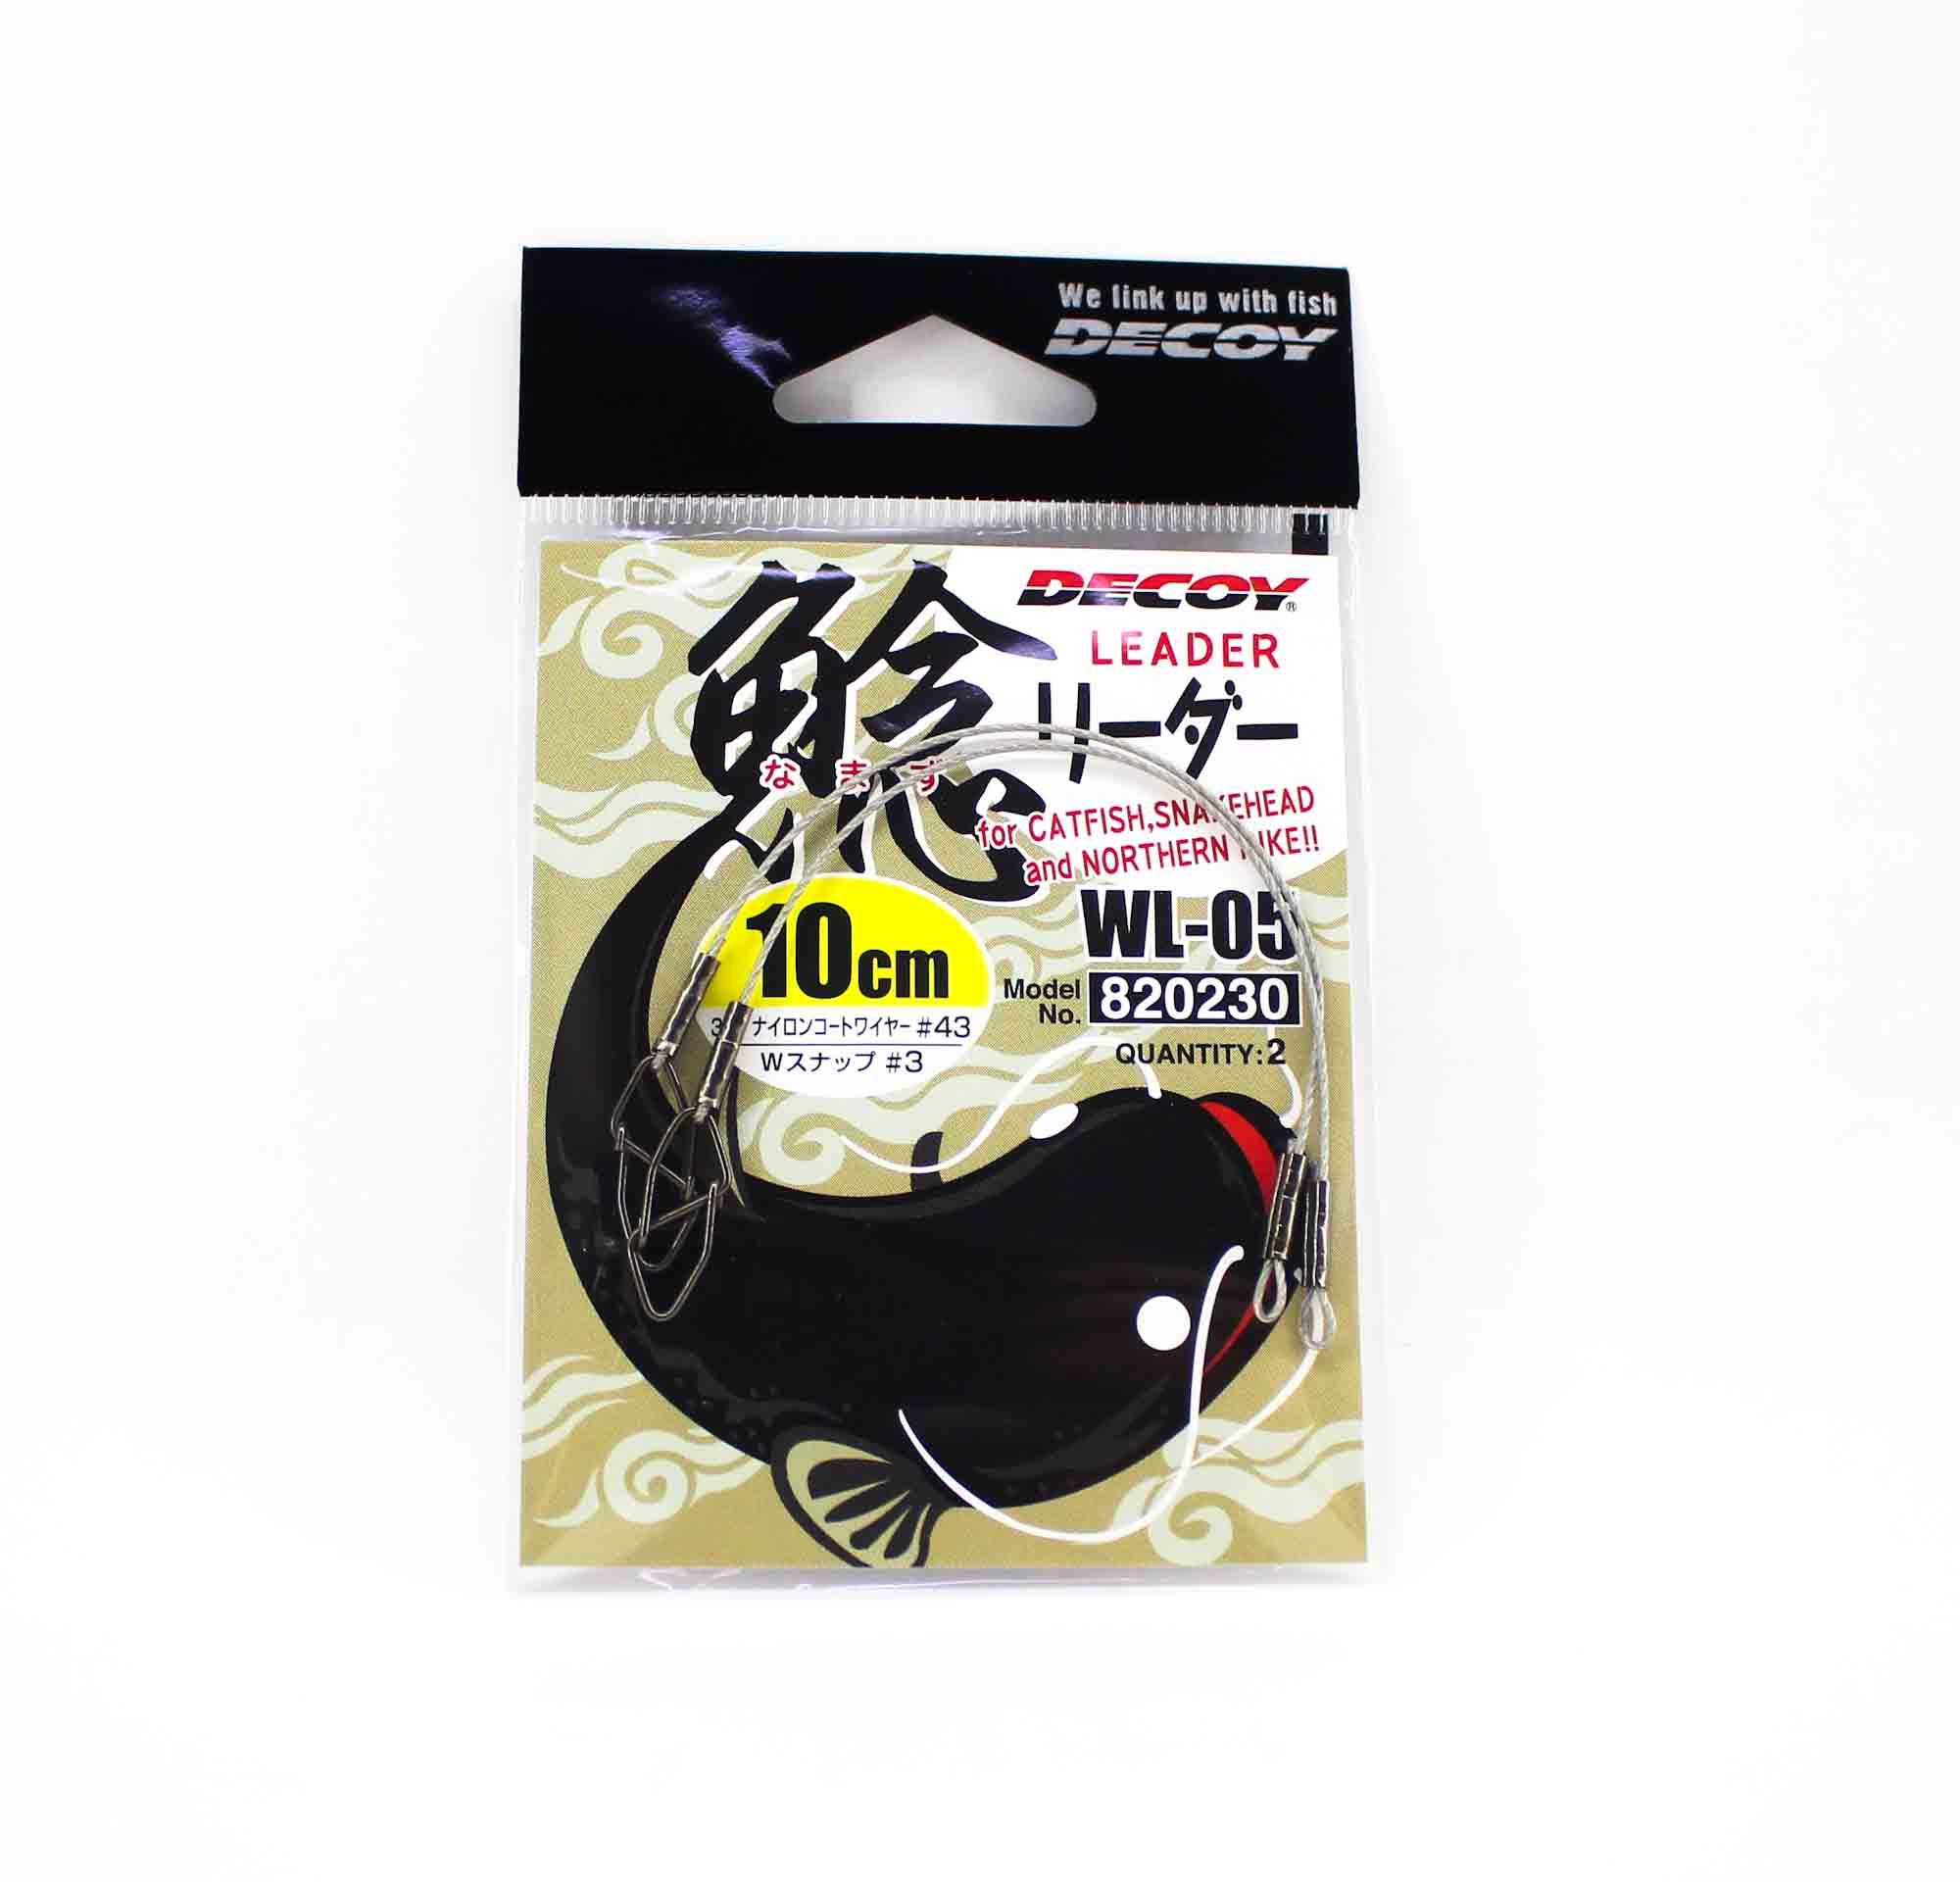 Decoy WL-05 Wire Leader 10cm #43 Snap Size 3 (0230)